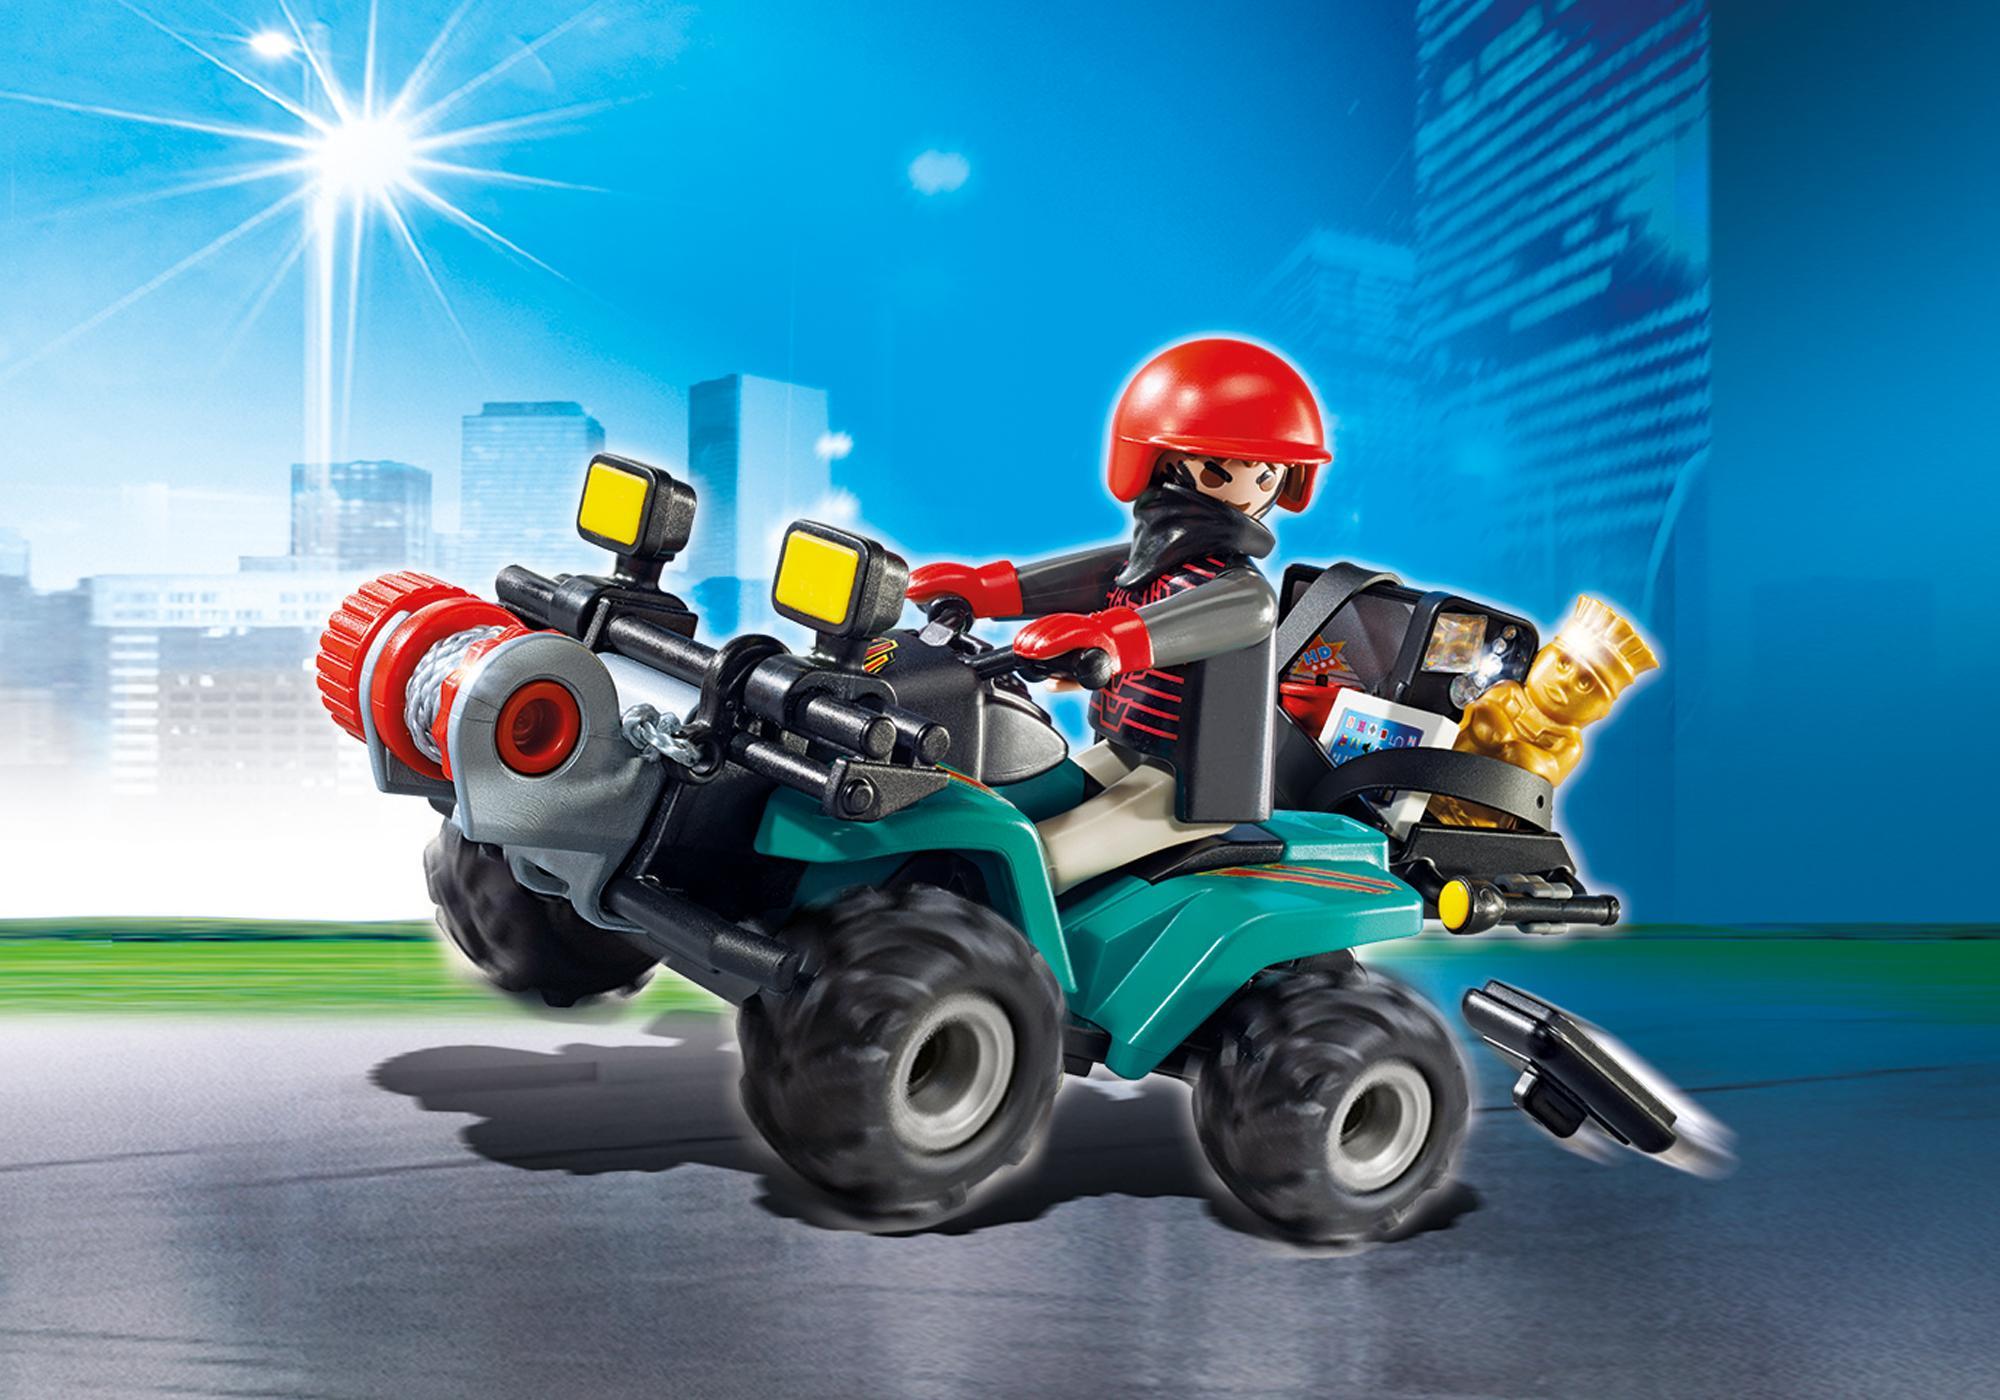 http://media.playmobil.com/i/playmobil/6879_product_detail